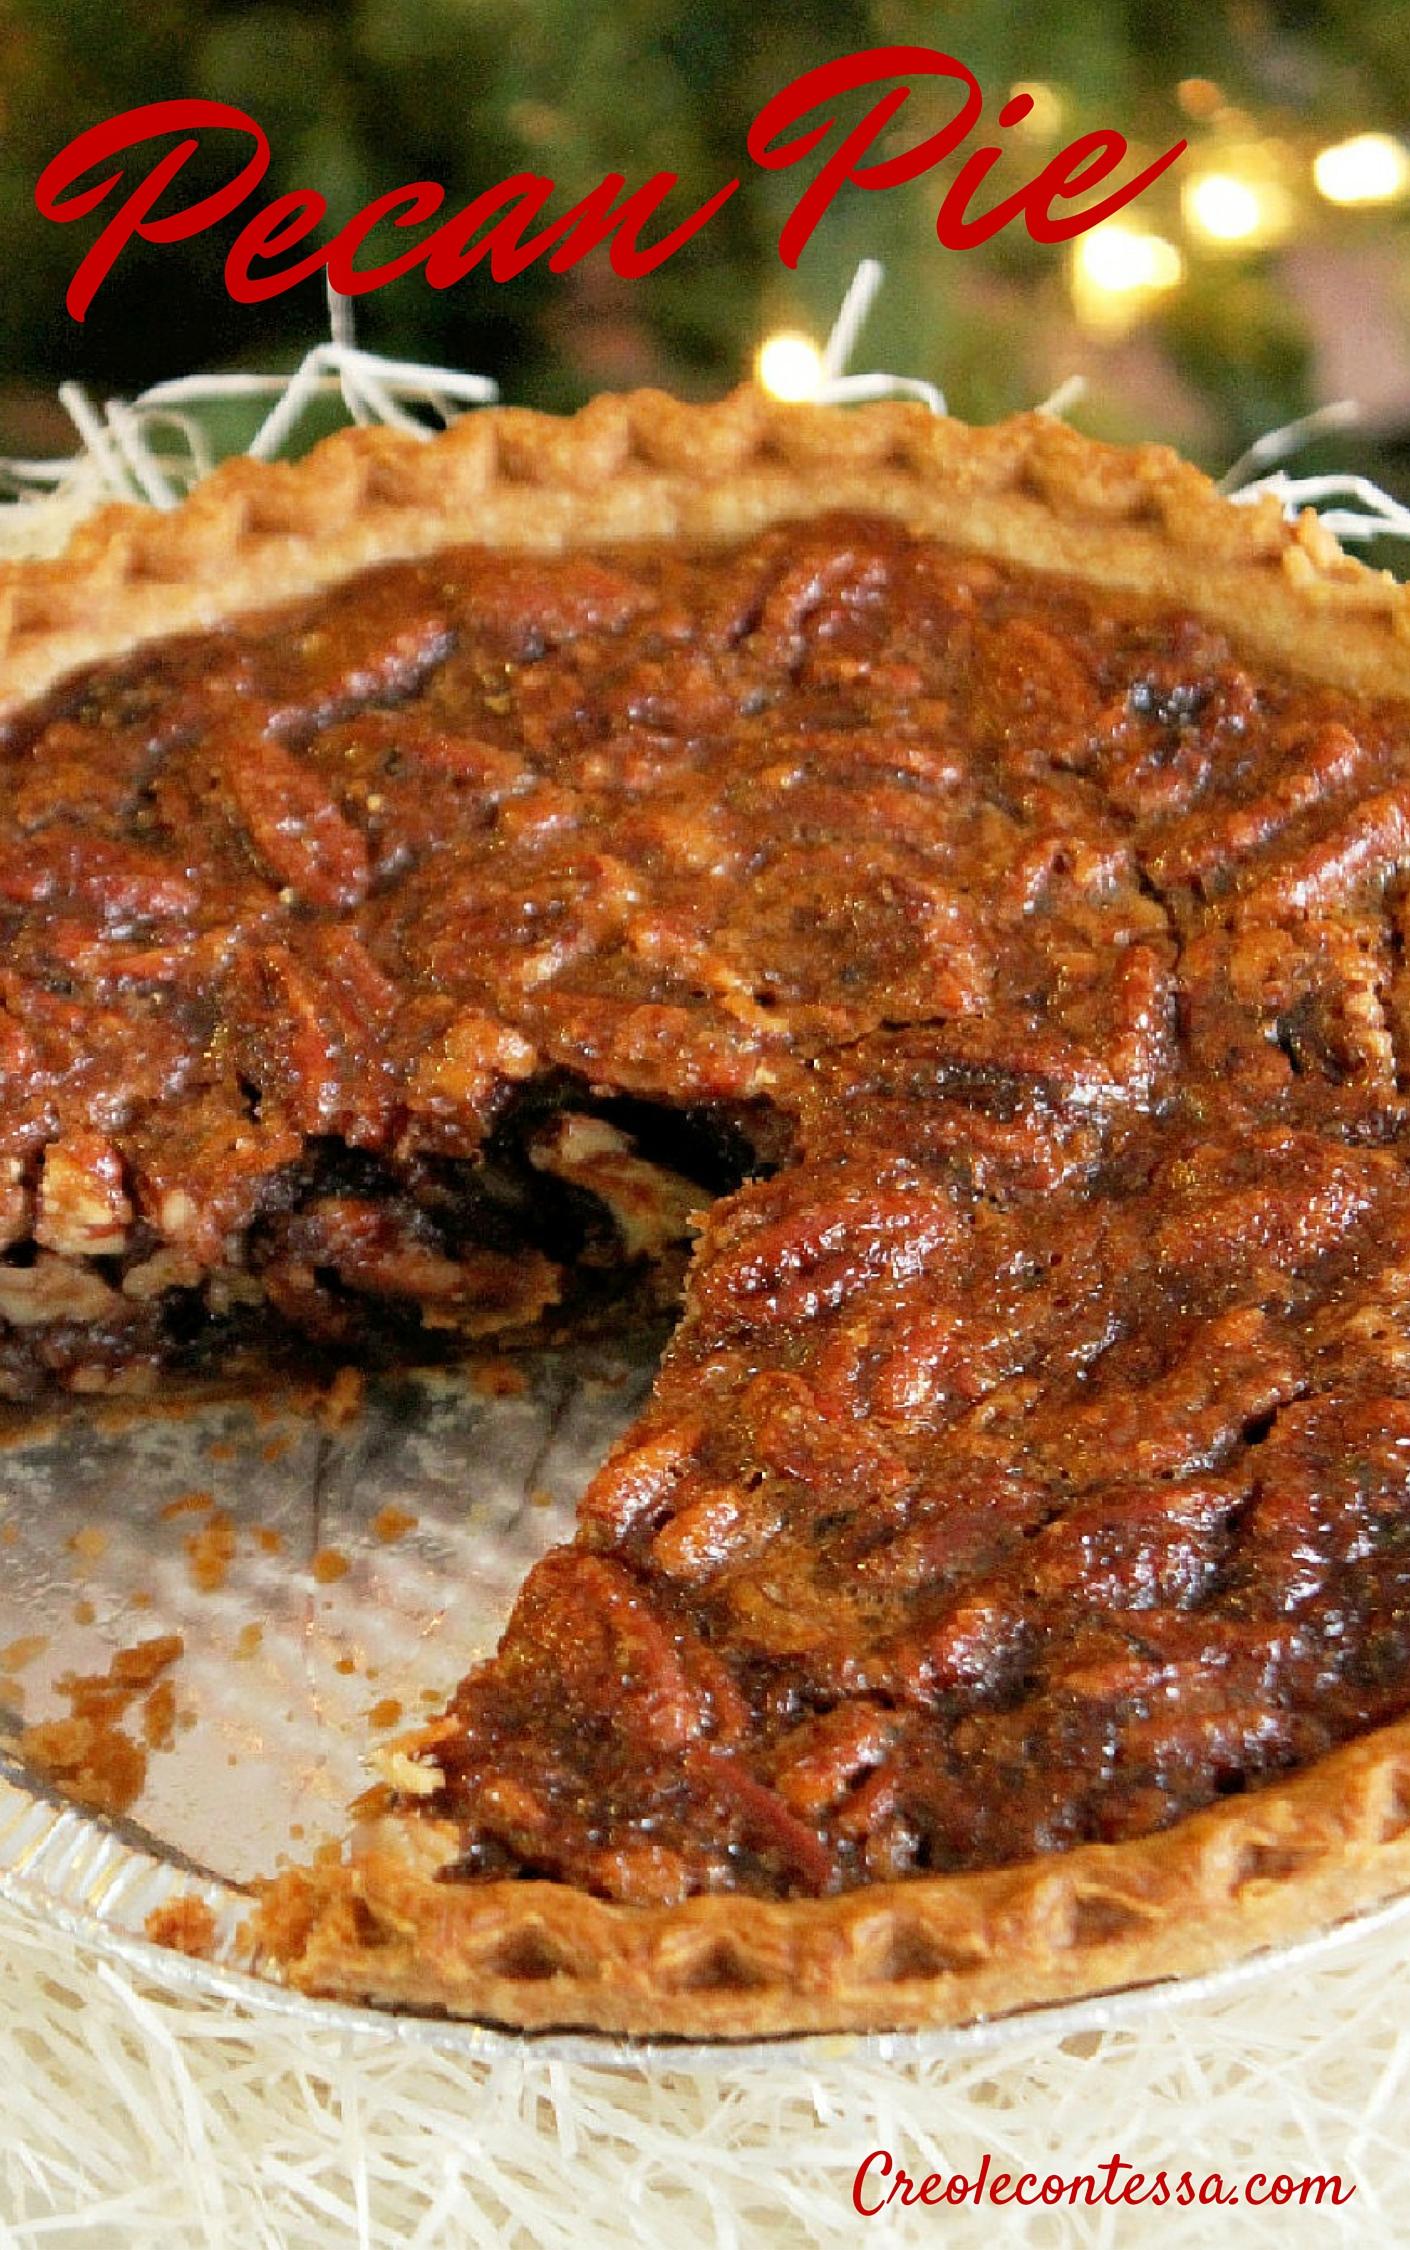 Loaded Pecan Pie-Creole Contessa